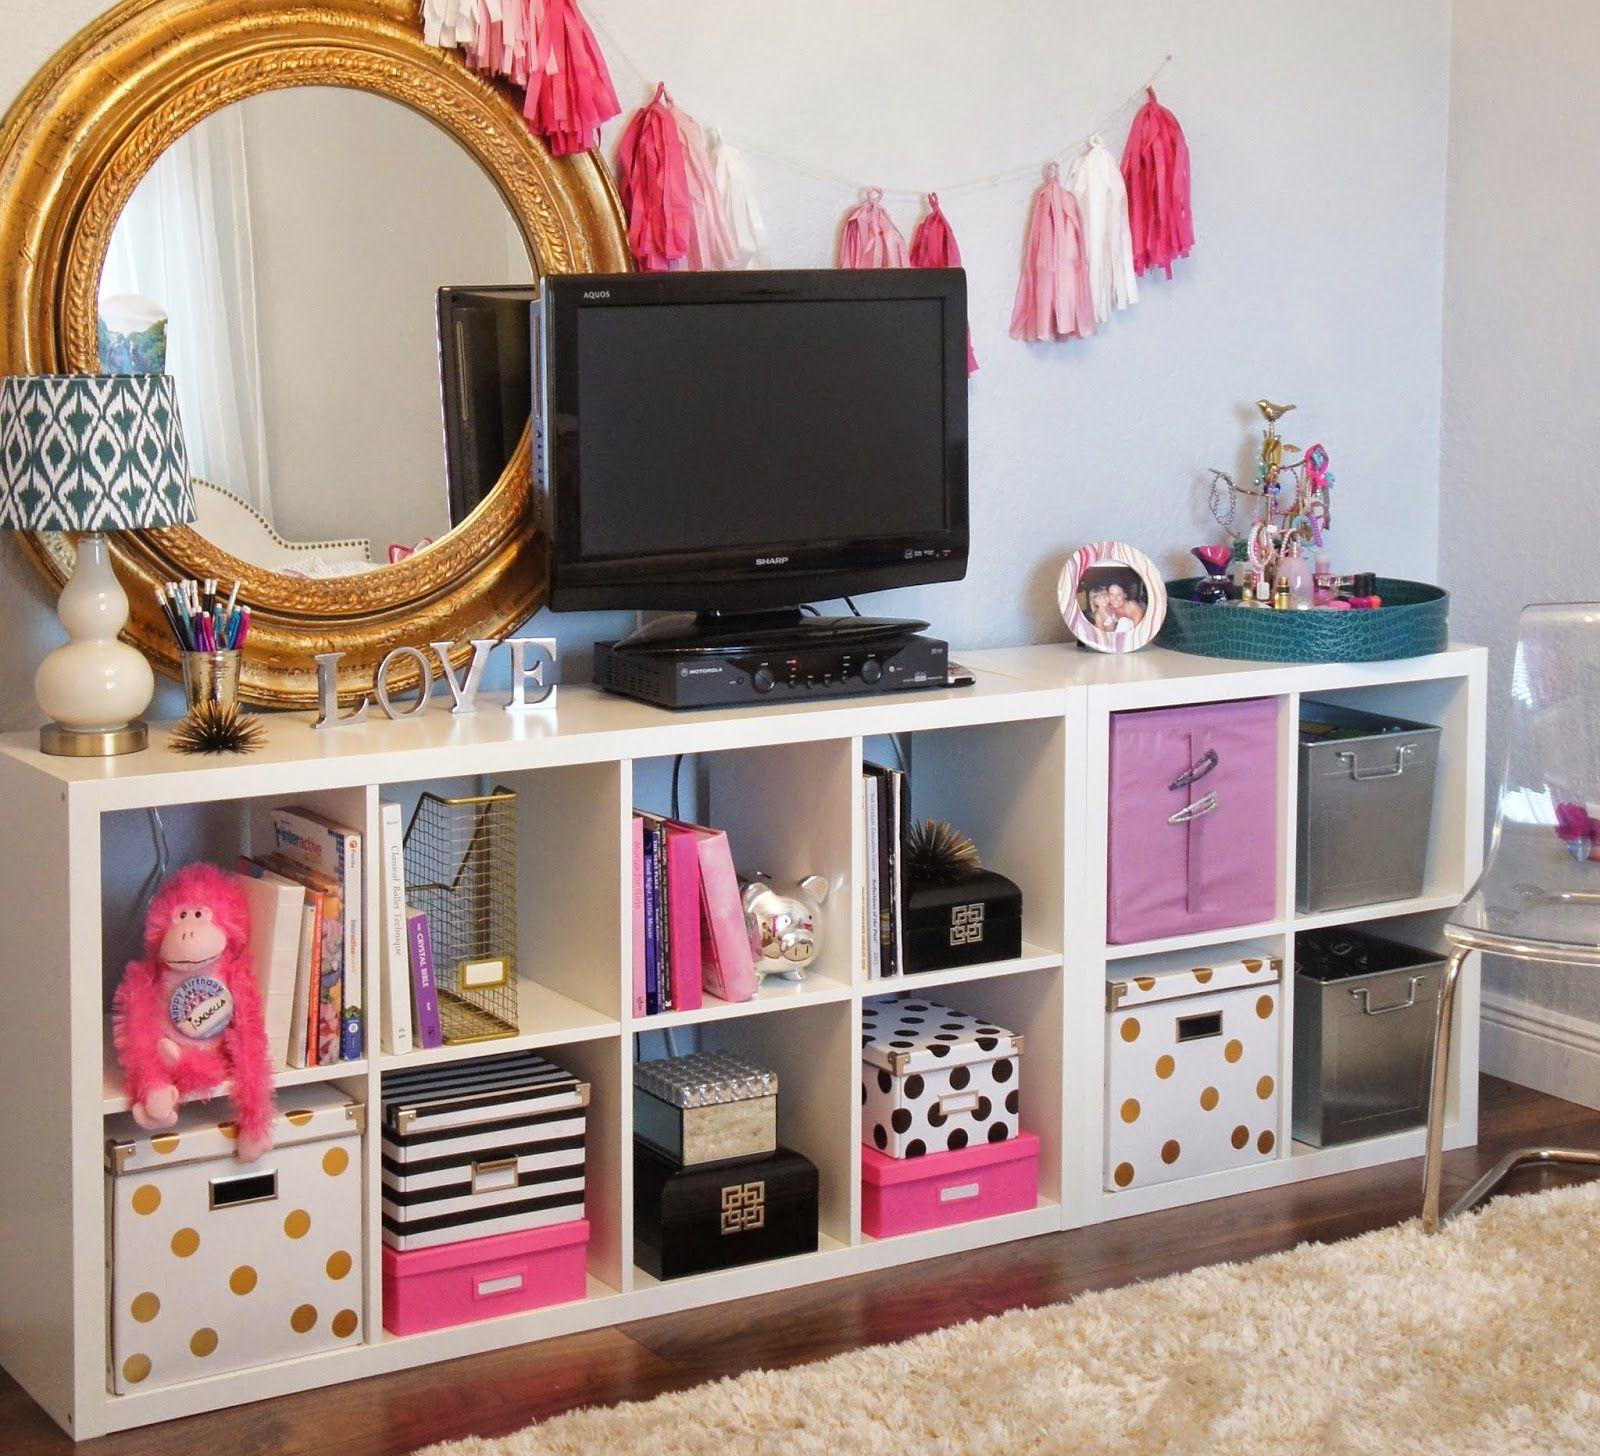 ikea office storage boxes. It\u0027s Friday!!!! Let Me Start By Saying I\u0027m Sorry,. Organization IdeasStorage IdeasIkea StorageOffice Ikea Office Storage Boxes U